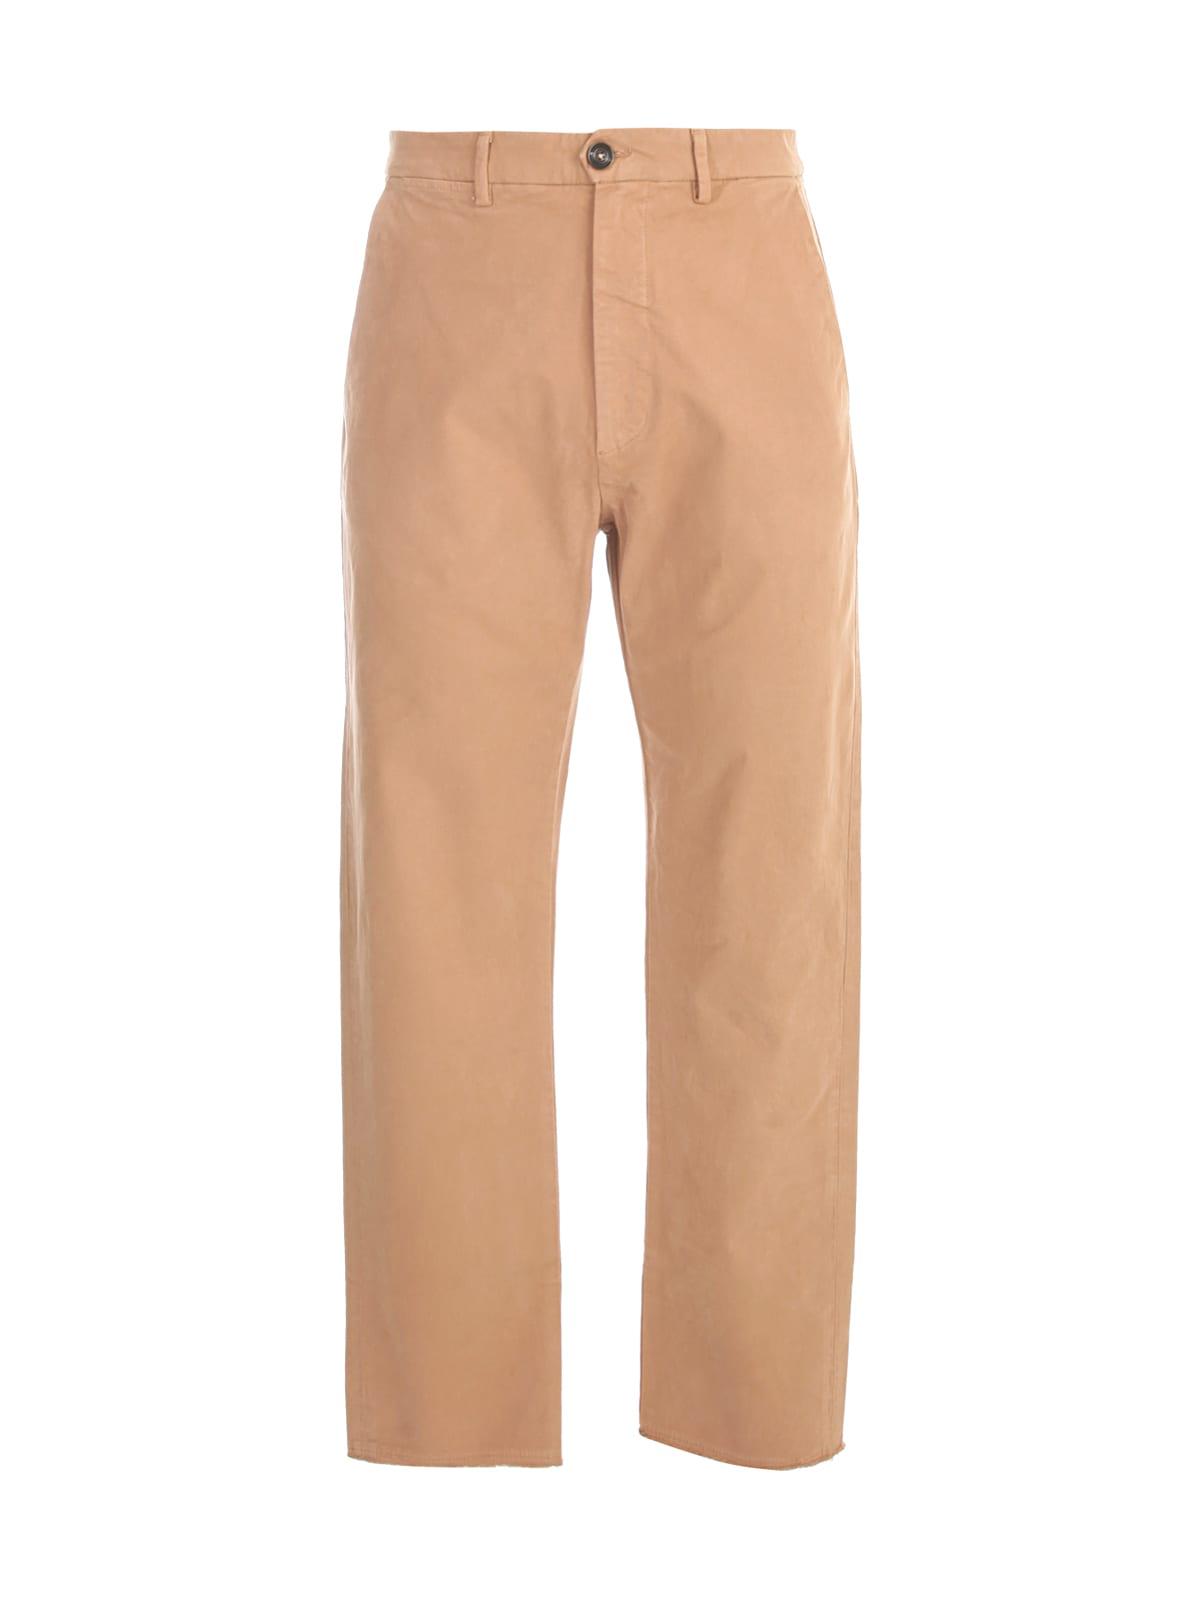 Pence Pants W/slit On Bottom